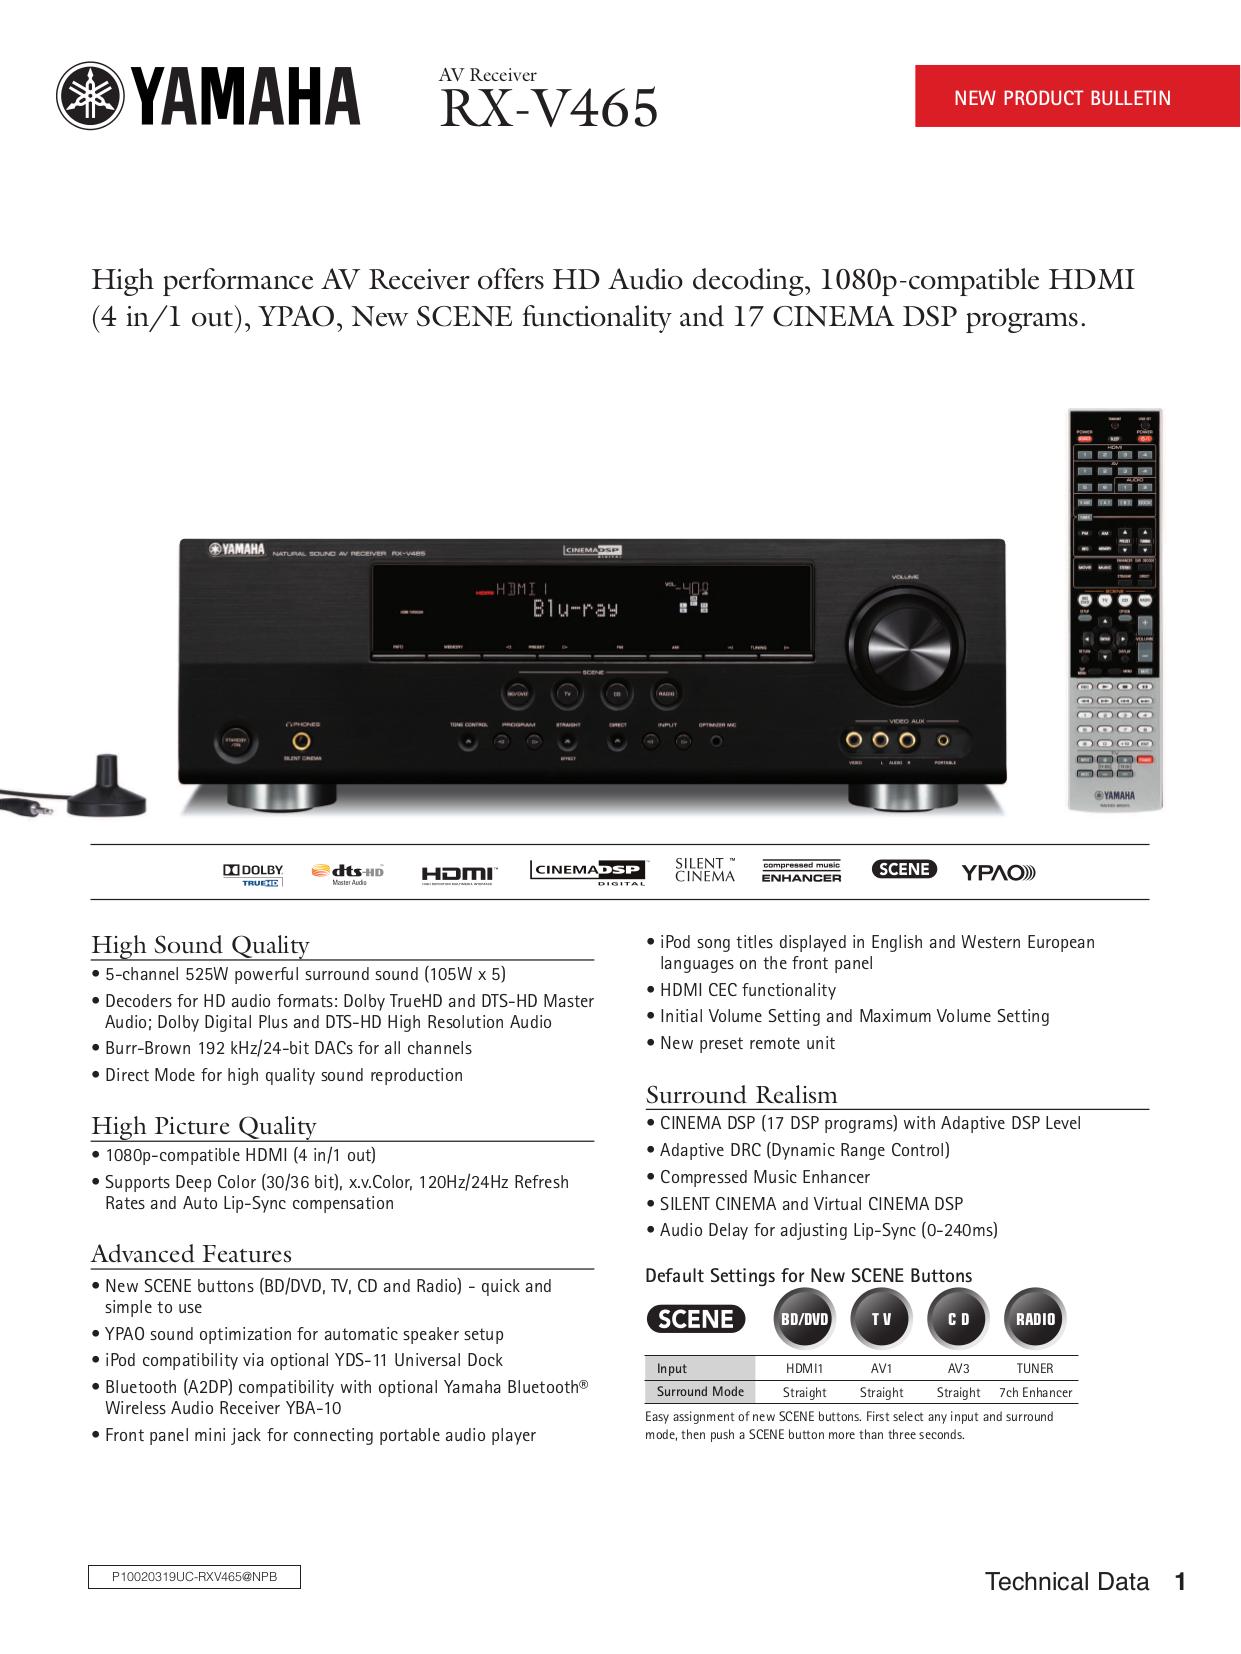 download free pdf for yamaha rx v465 receiver manual rh umlib com Yamaha RX 665 Manual Yamaha RX-V665 Optical